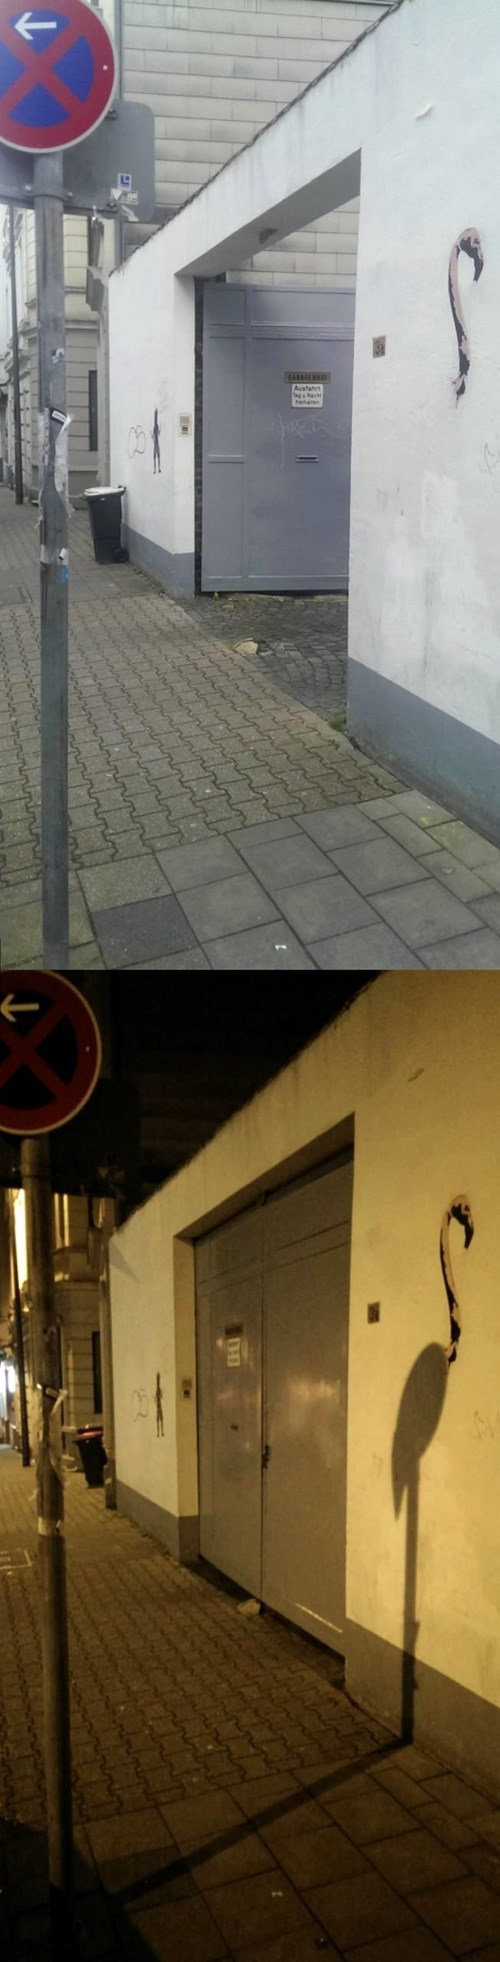 Street Art creative shadows flamingo - 8042970368